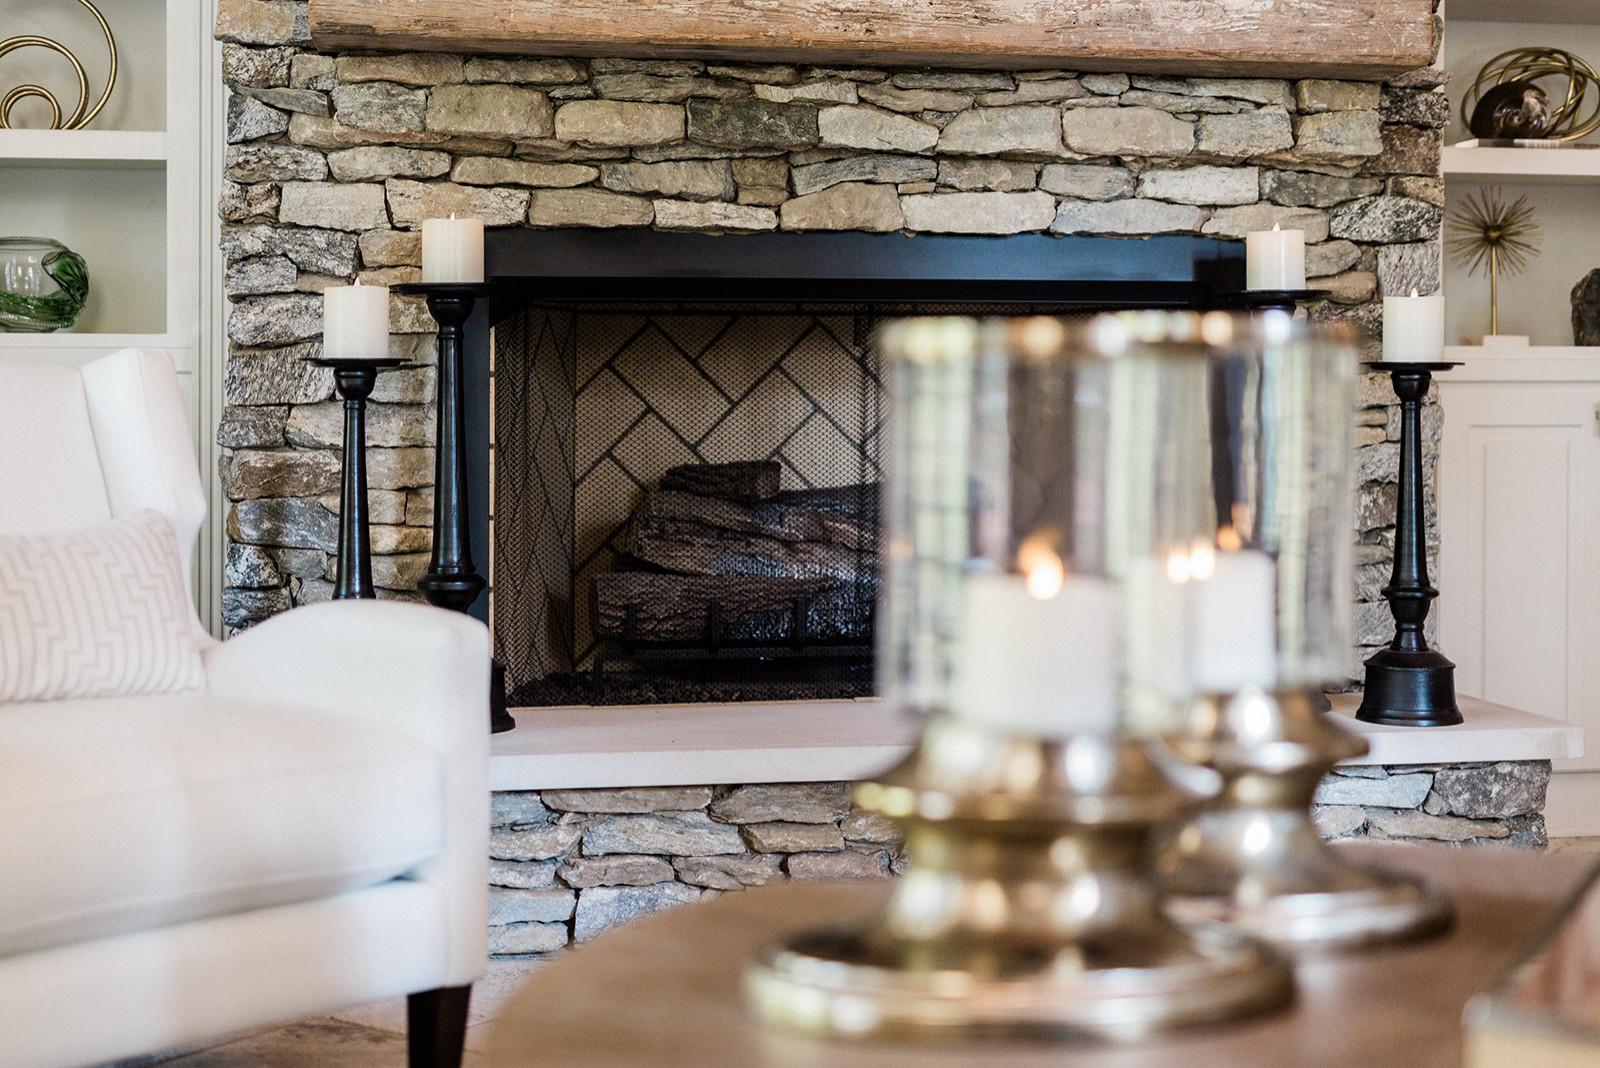 Ross Bridge Custom Fireplace and Mantle